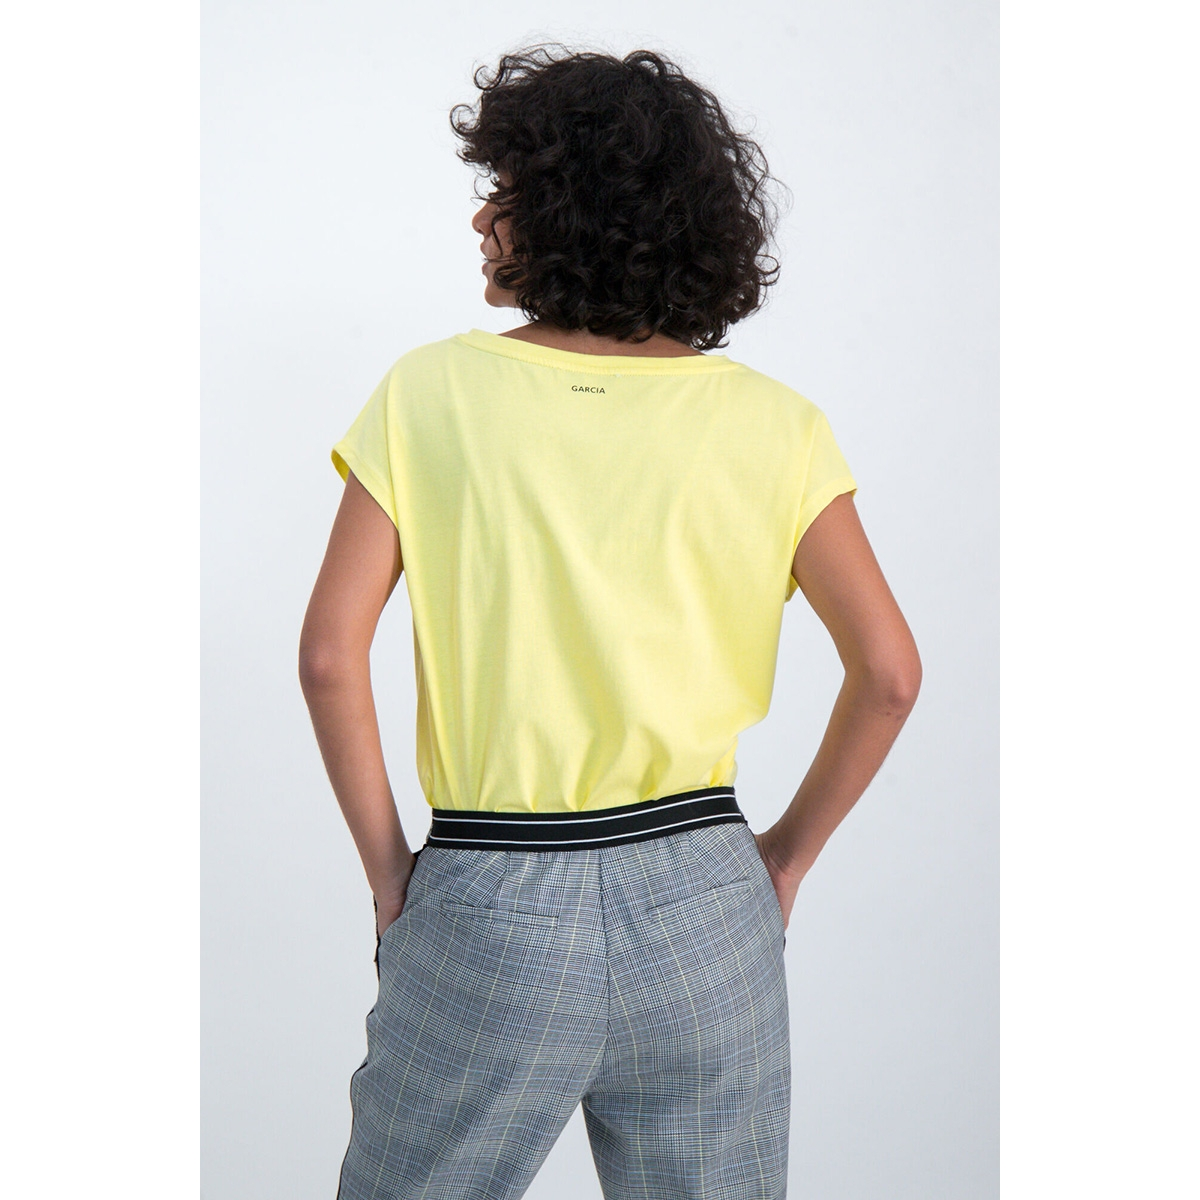 t shirt met tekst print m00001 garcia t-shirt 145 limelight